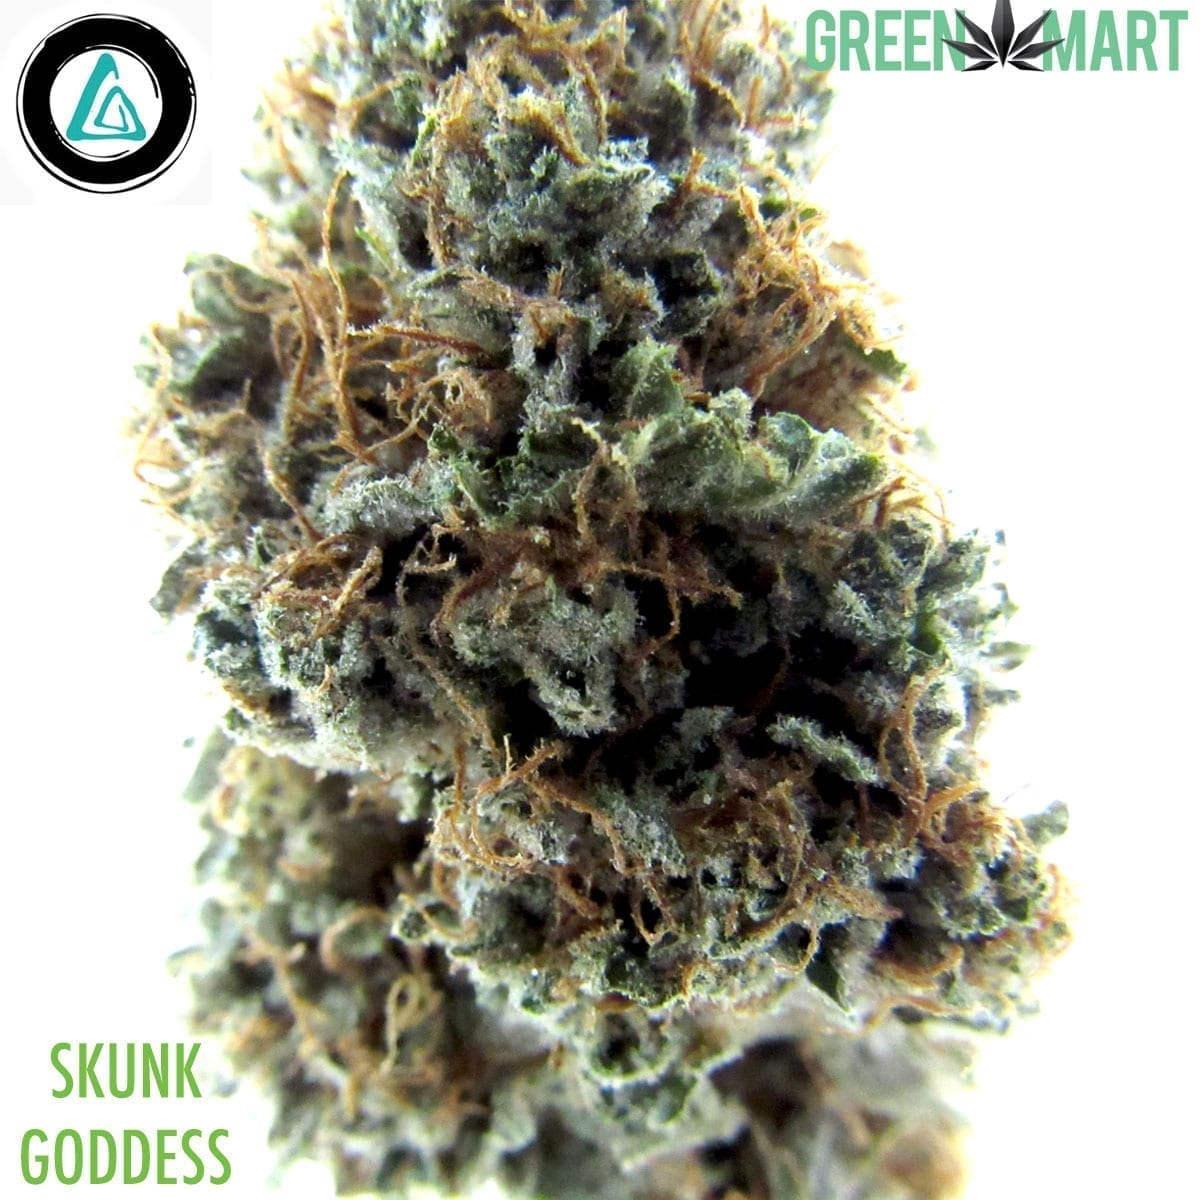 Skunk Goddess by Alibi Cannabis